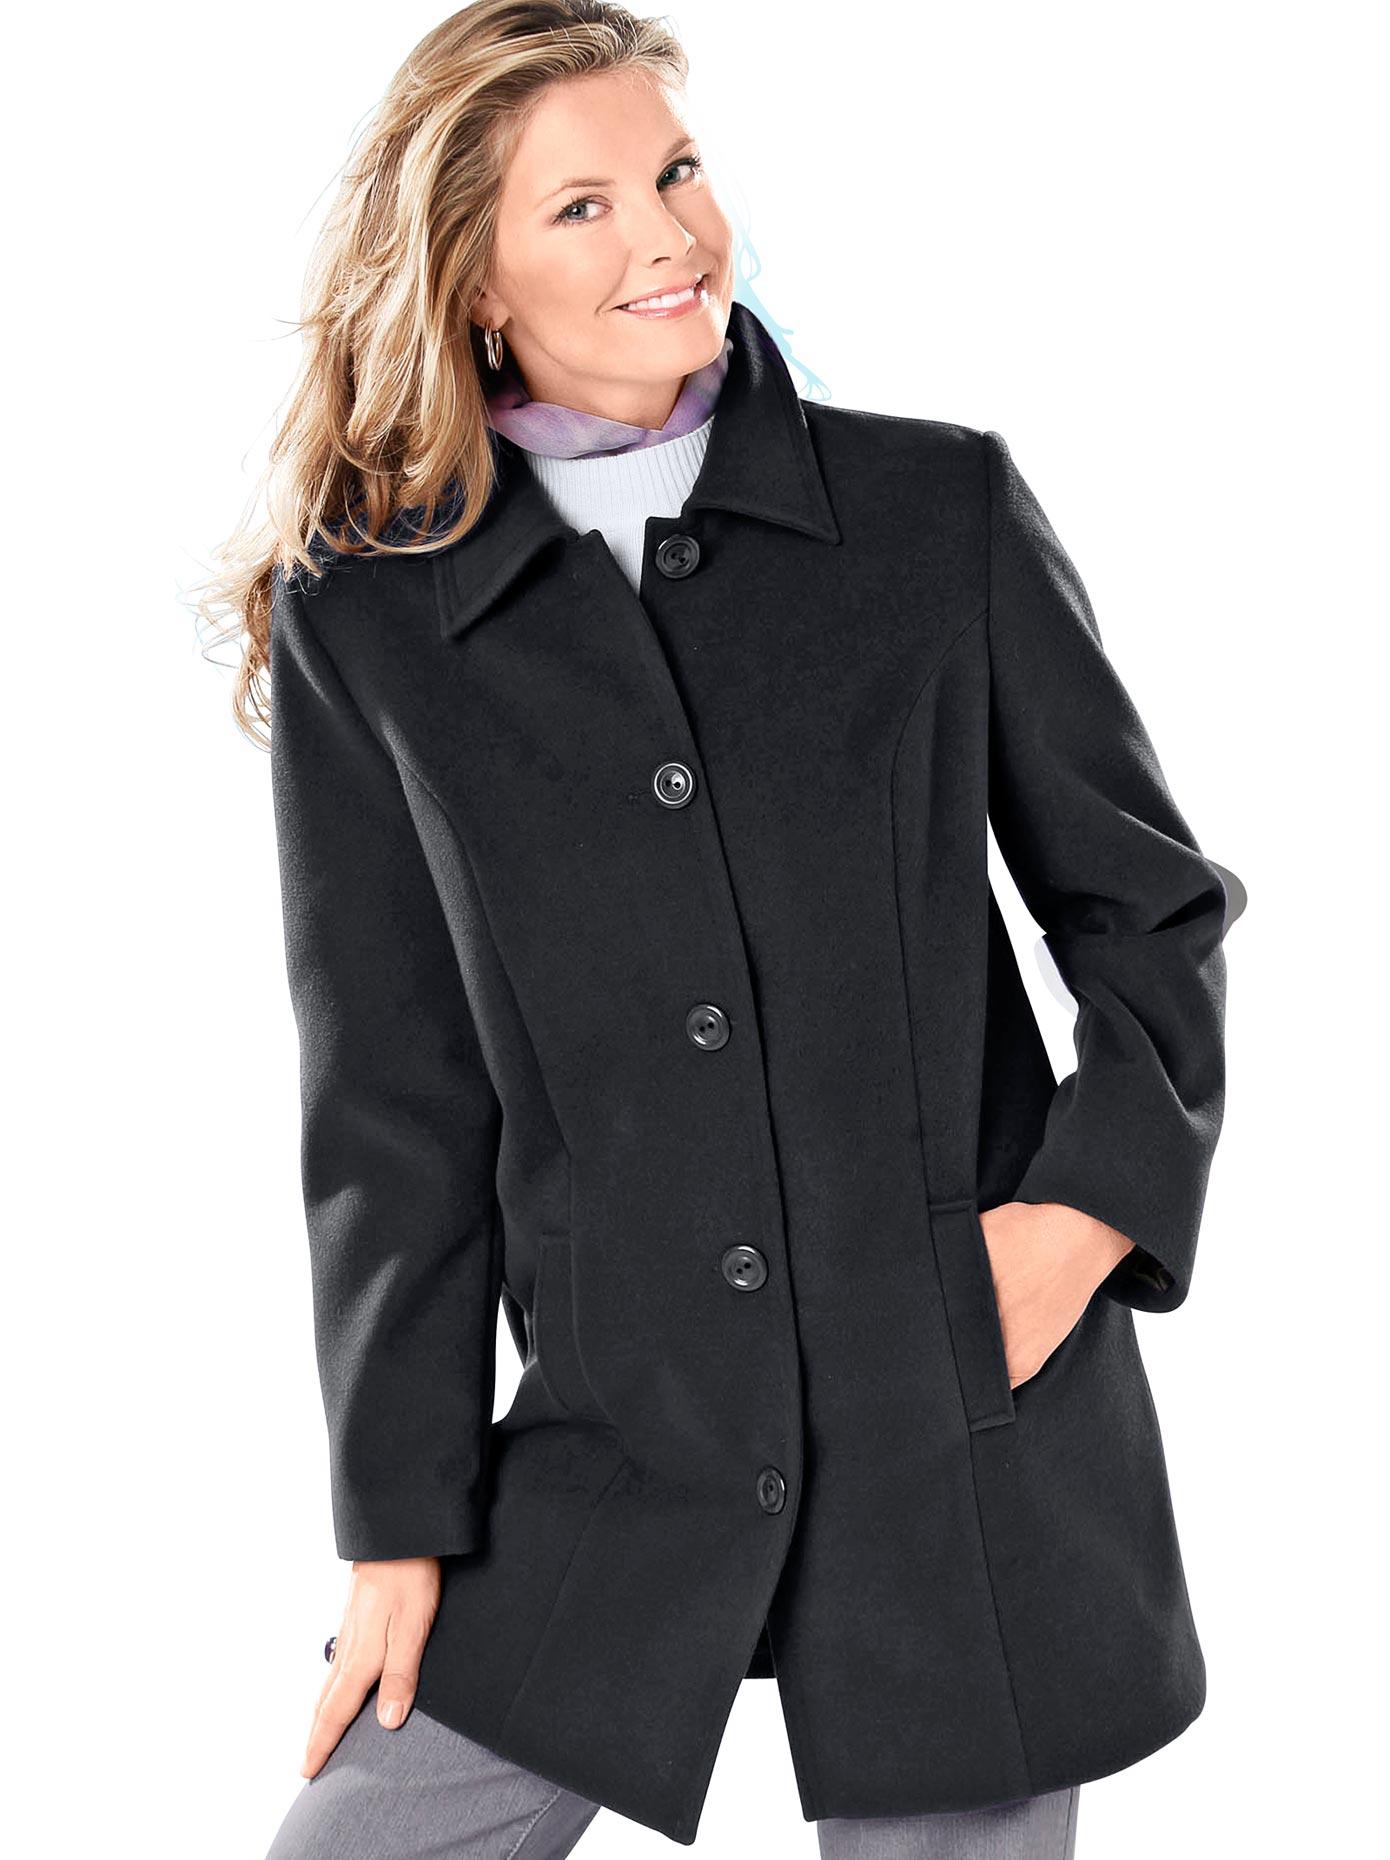 Classic Basics Mantel mit Schulterpolster